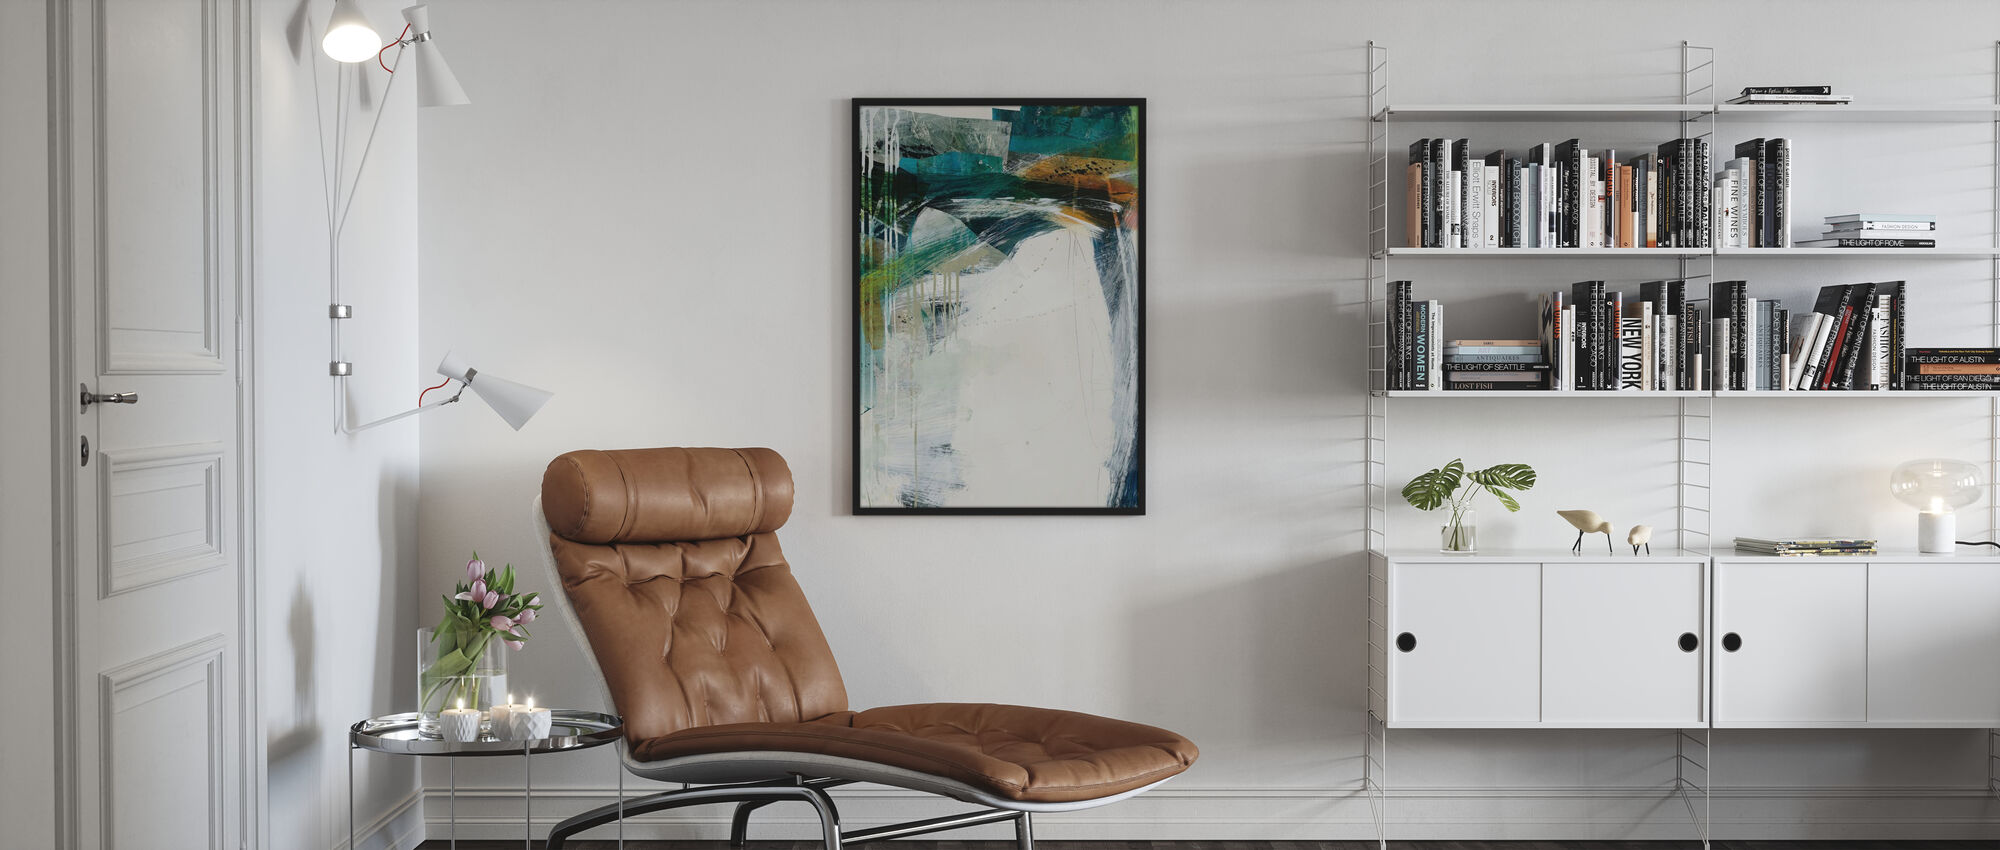 Turbulence iii - Poster - Living Room